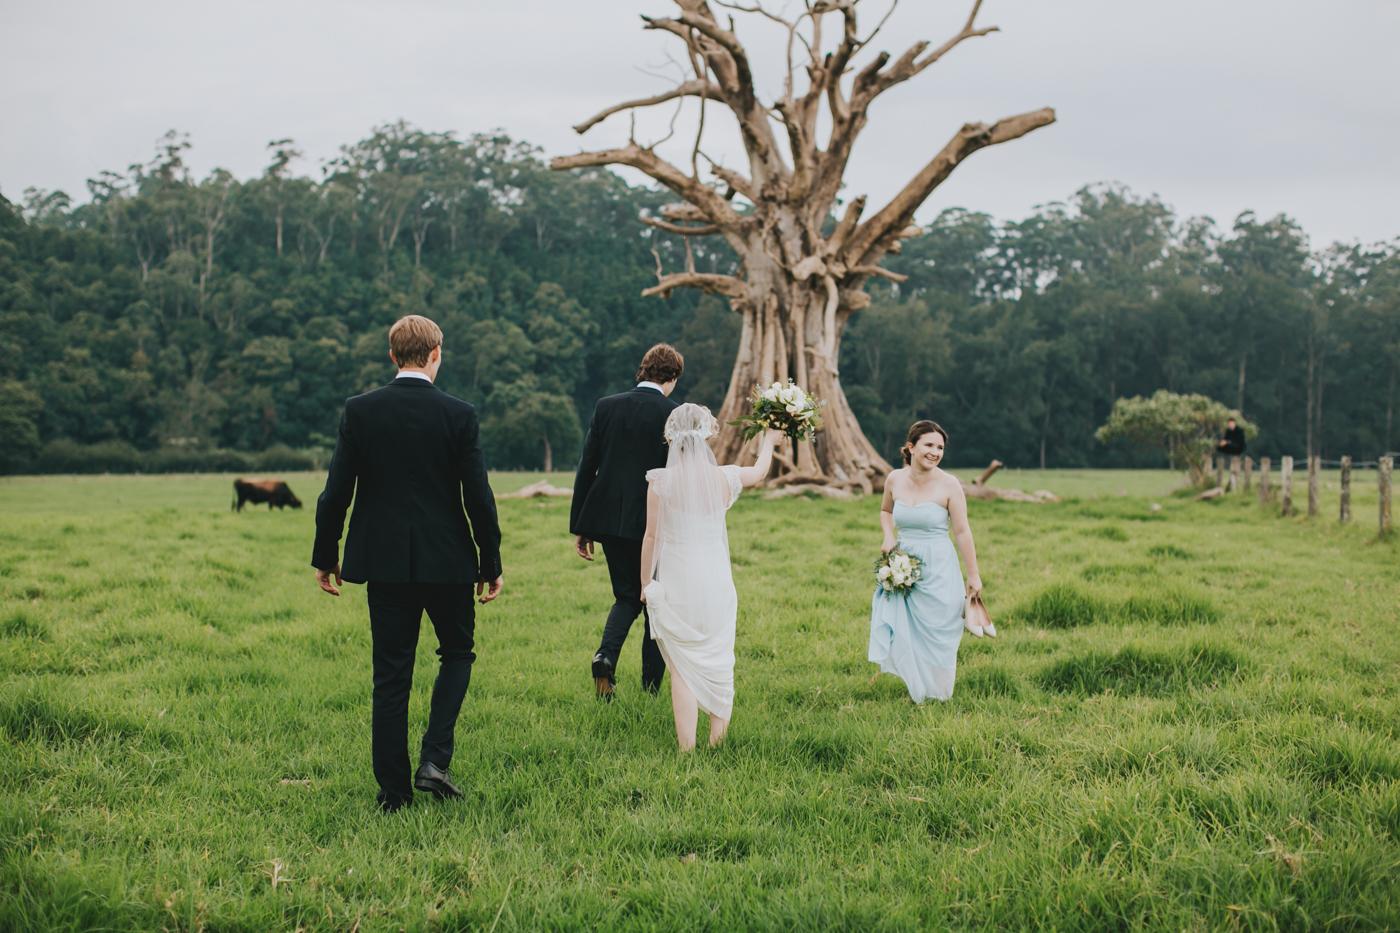 Rachel & Jacob - Willow Farm Berry - South Coast Wedding - Samantha Heather Photography-102.jpg